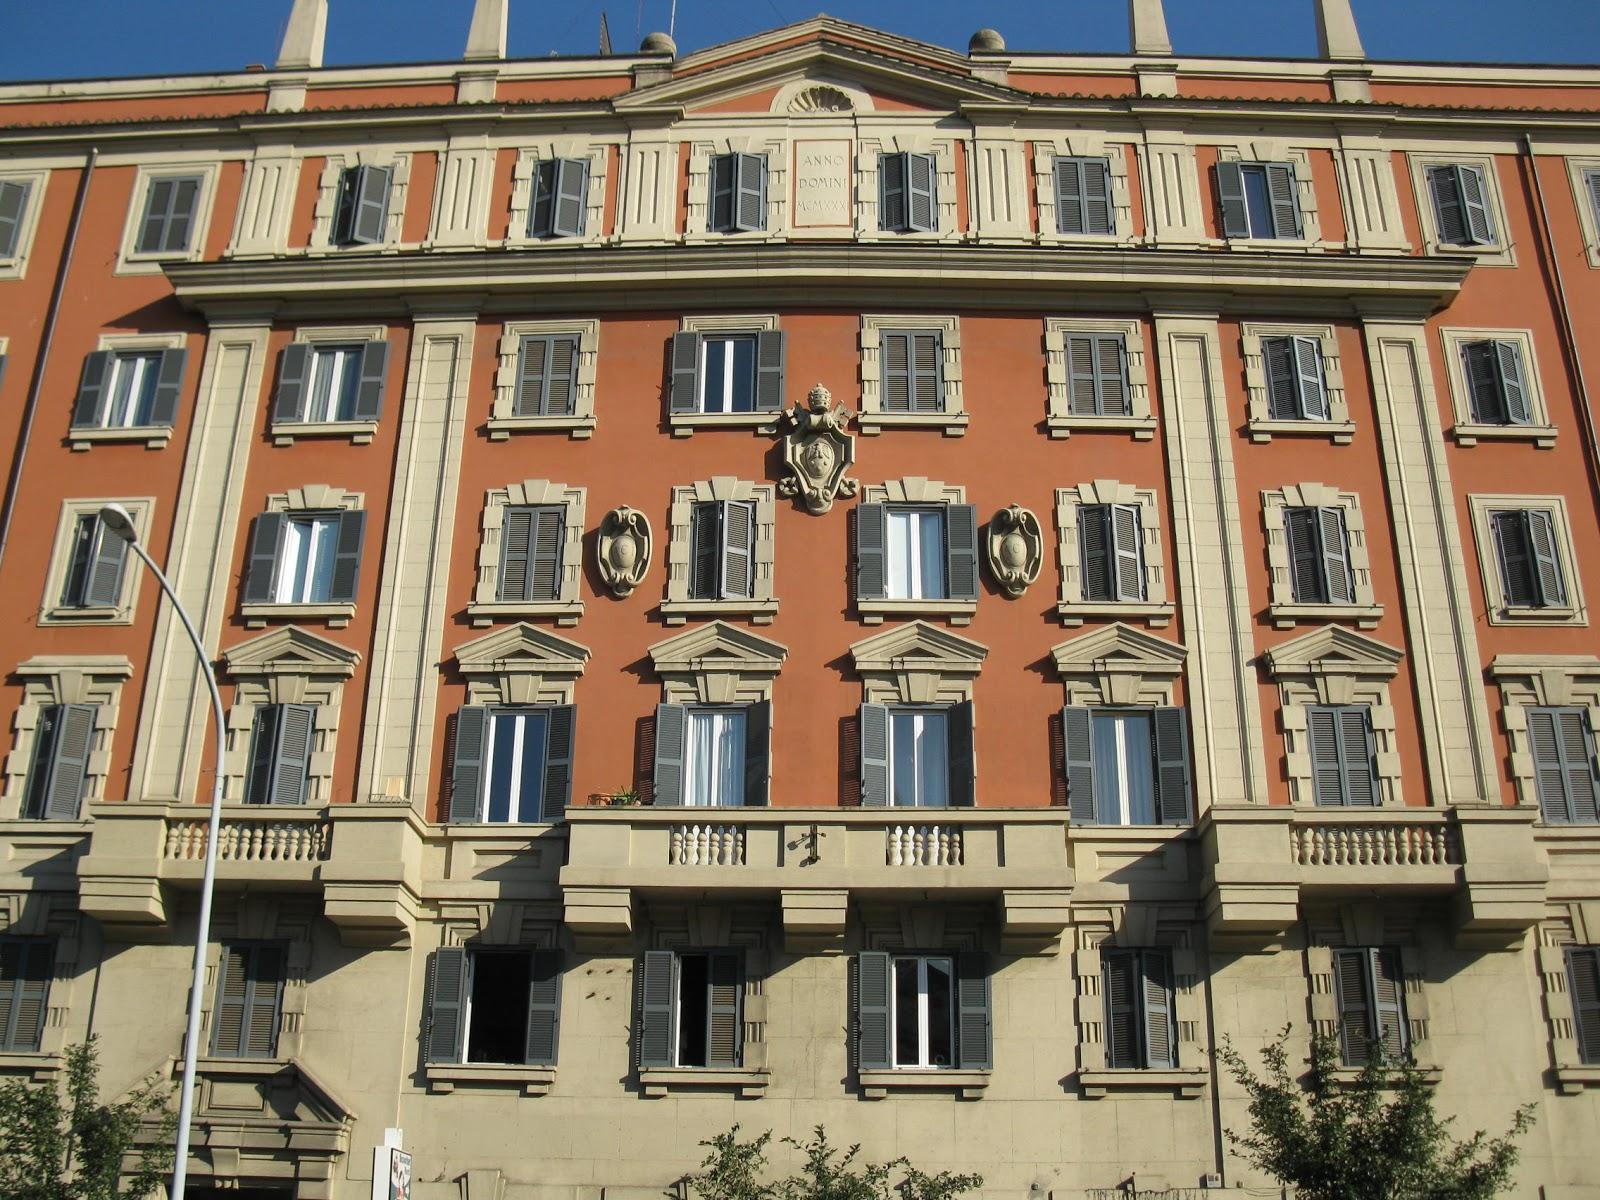 Orbis catholicus secundus 1930s architecture in rome for Architecture 1930